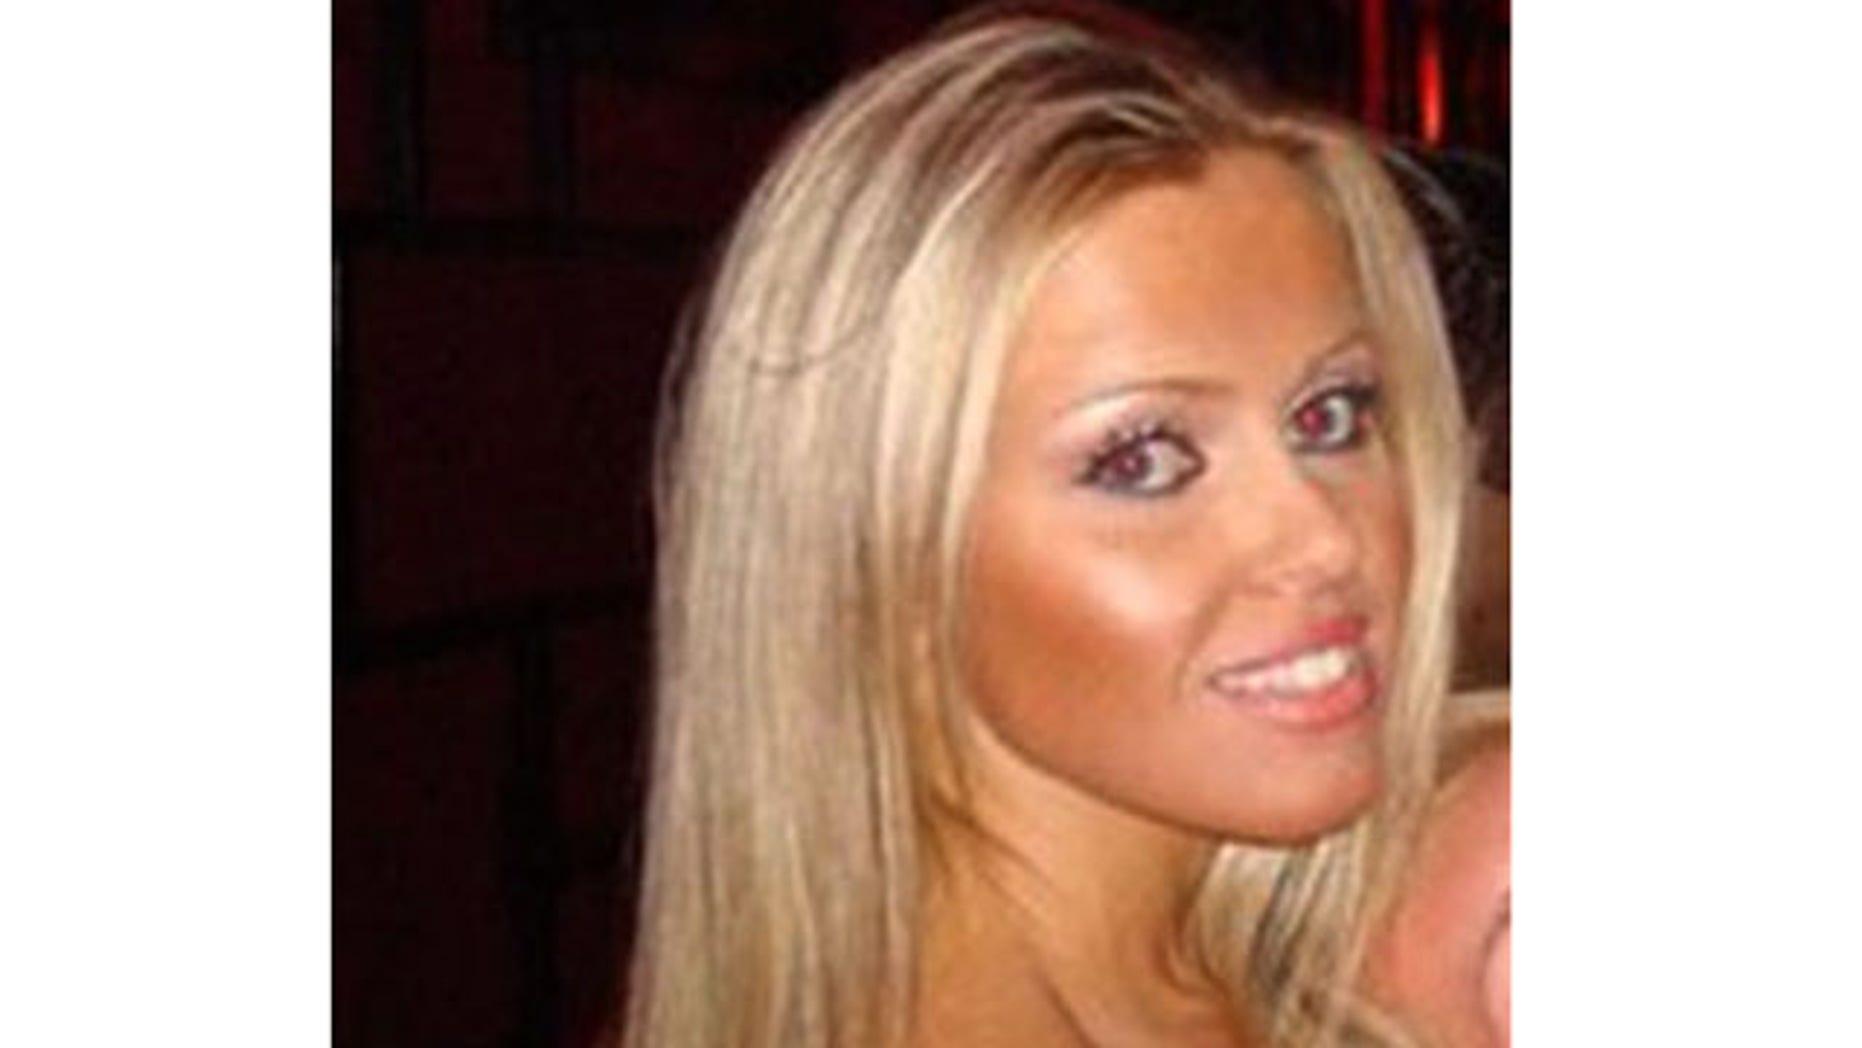 Undated photo of 27-year-old Larisa Prikhodko.